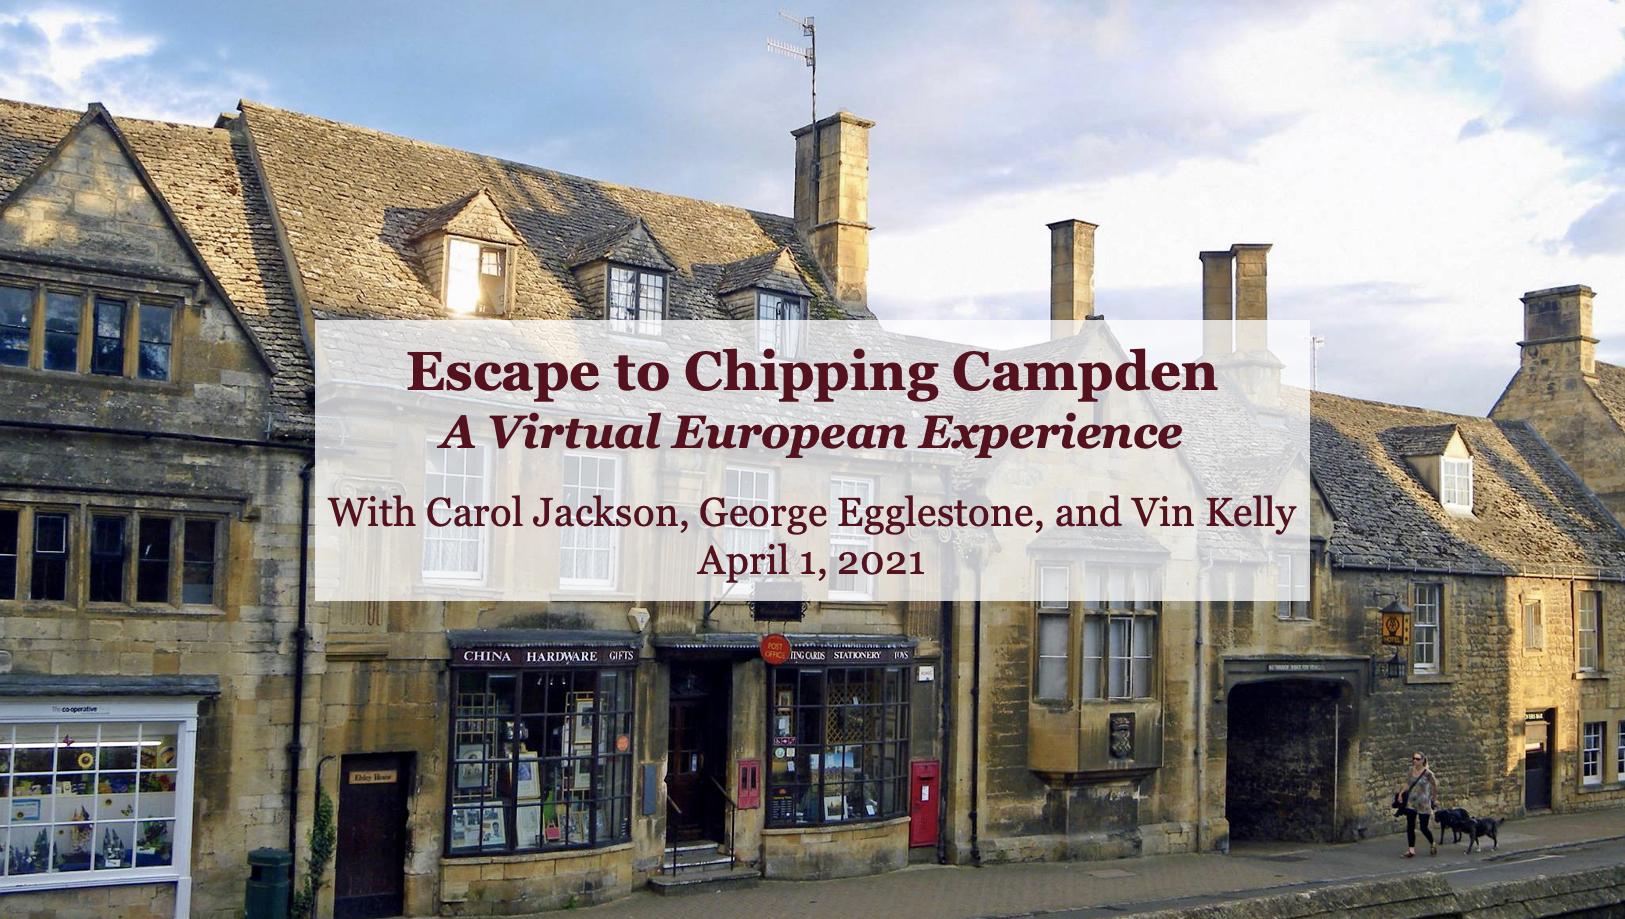 Escape to Chipping Campden